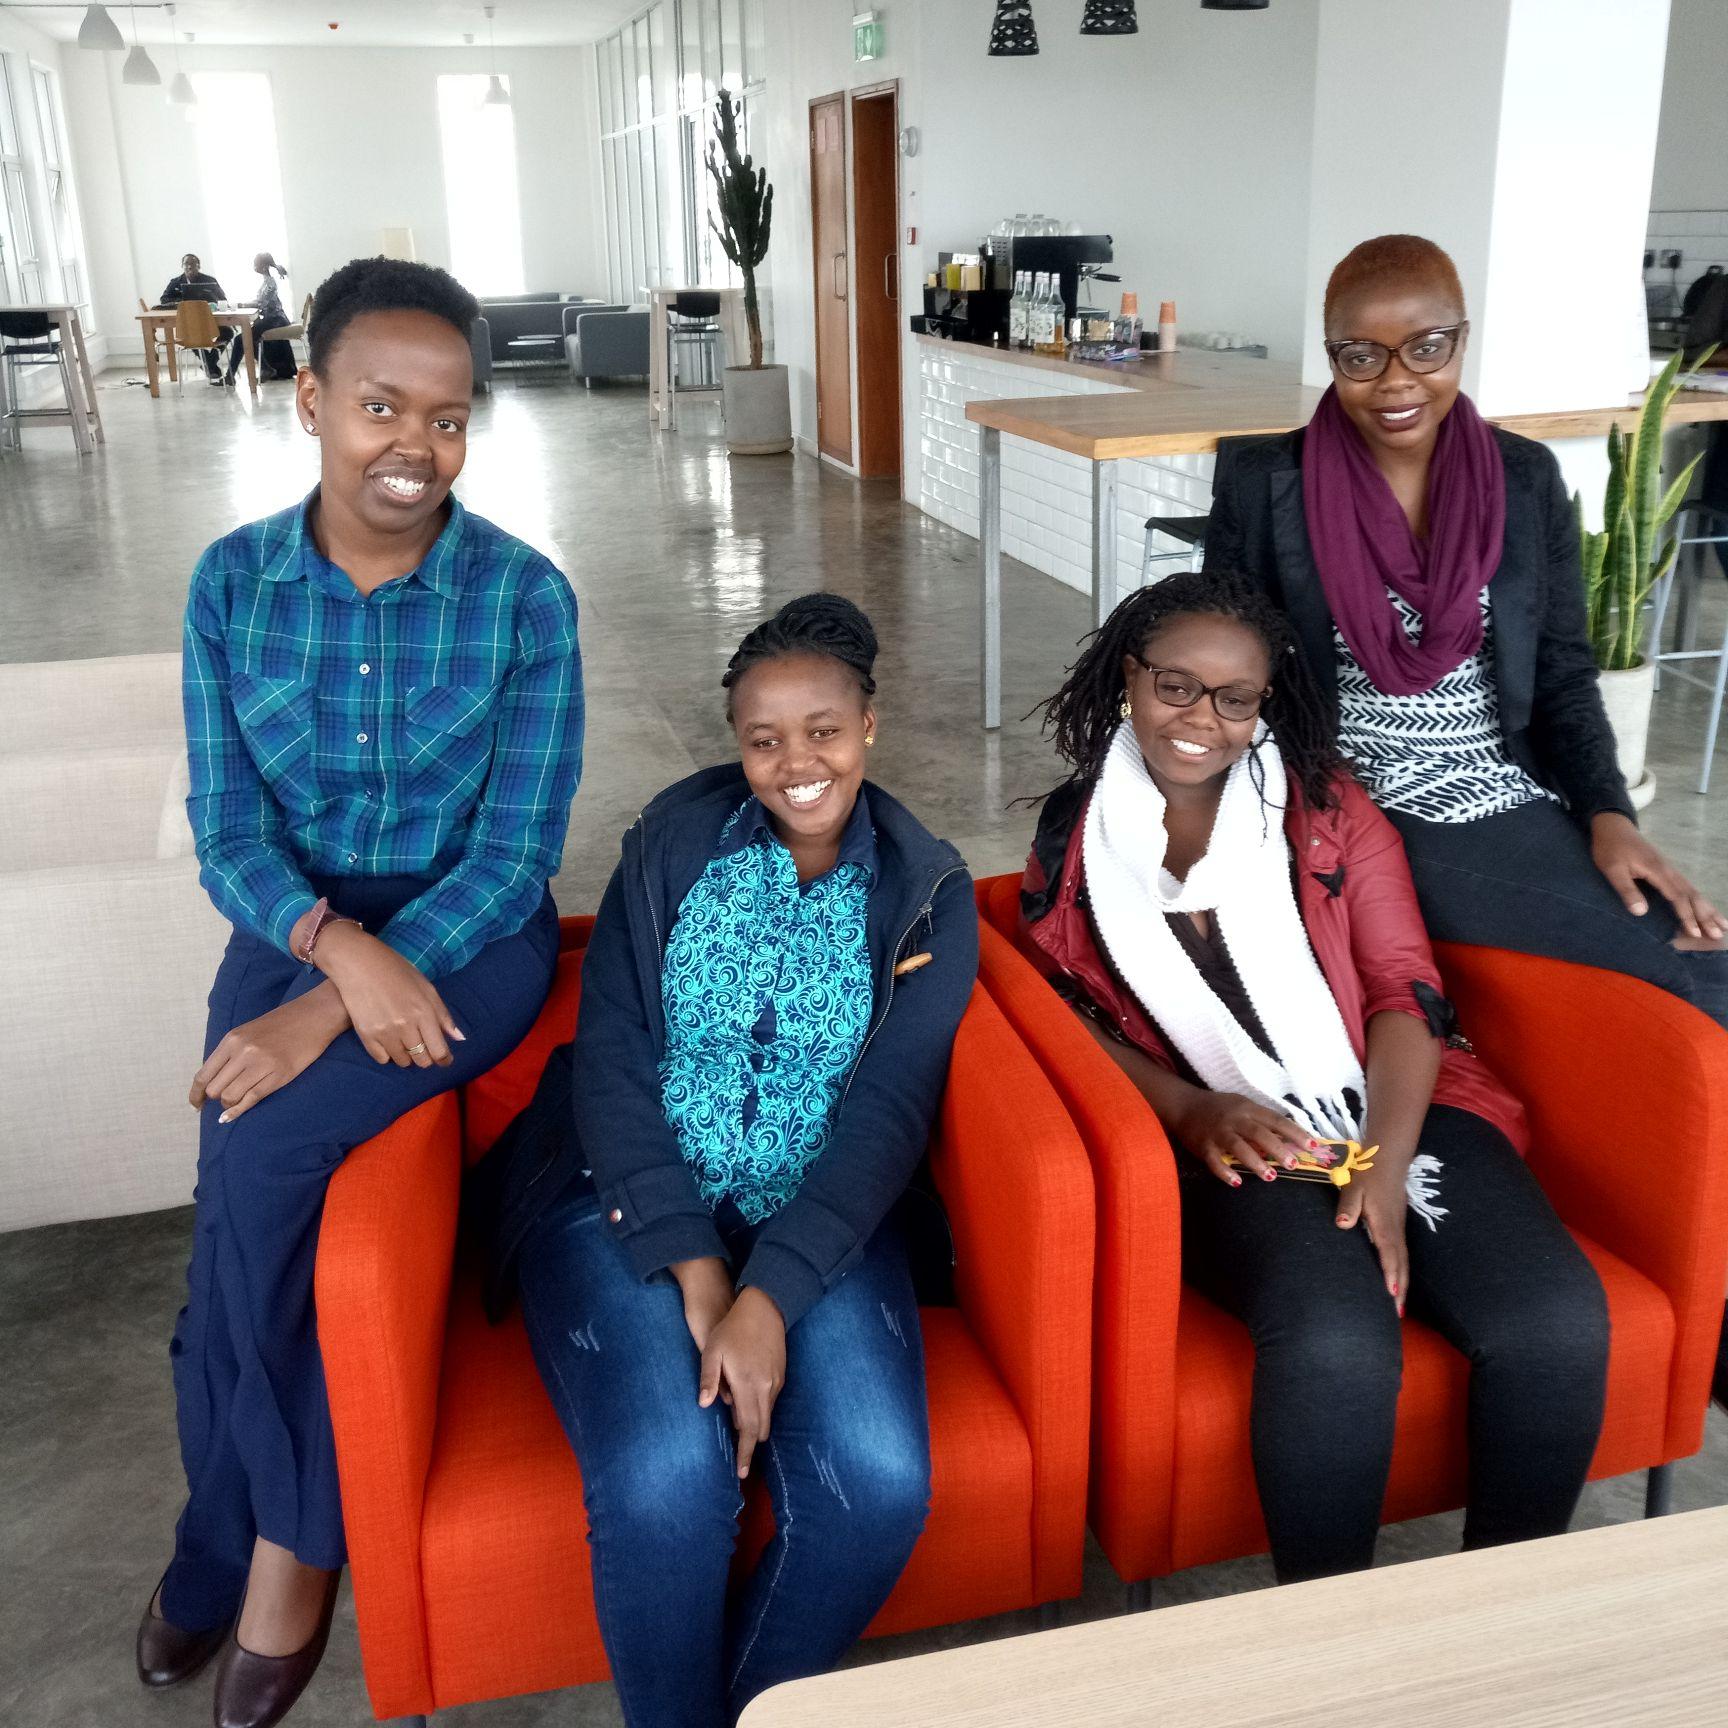 Nairobi team